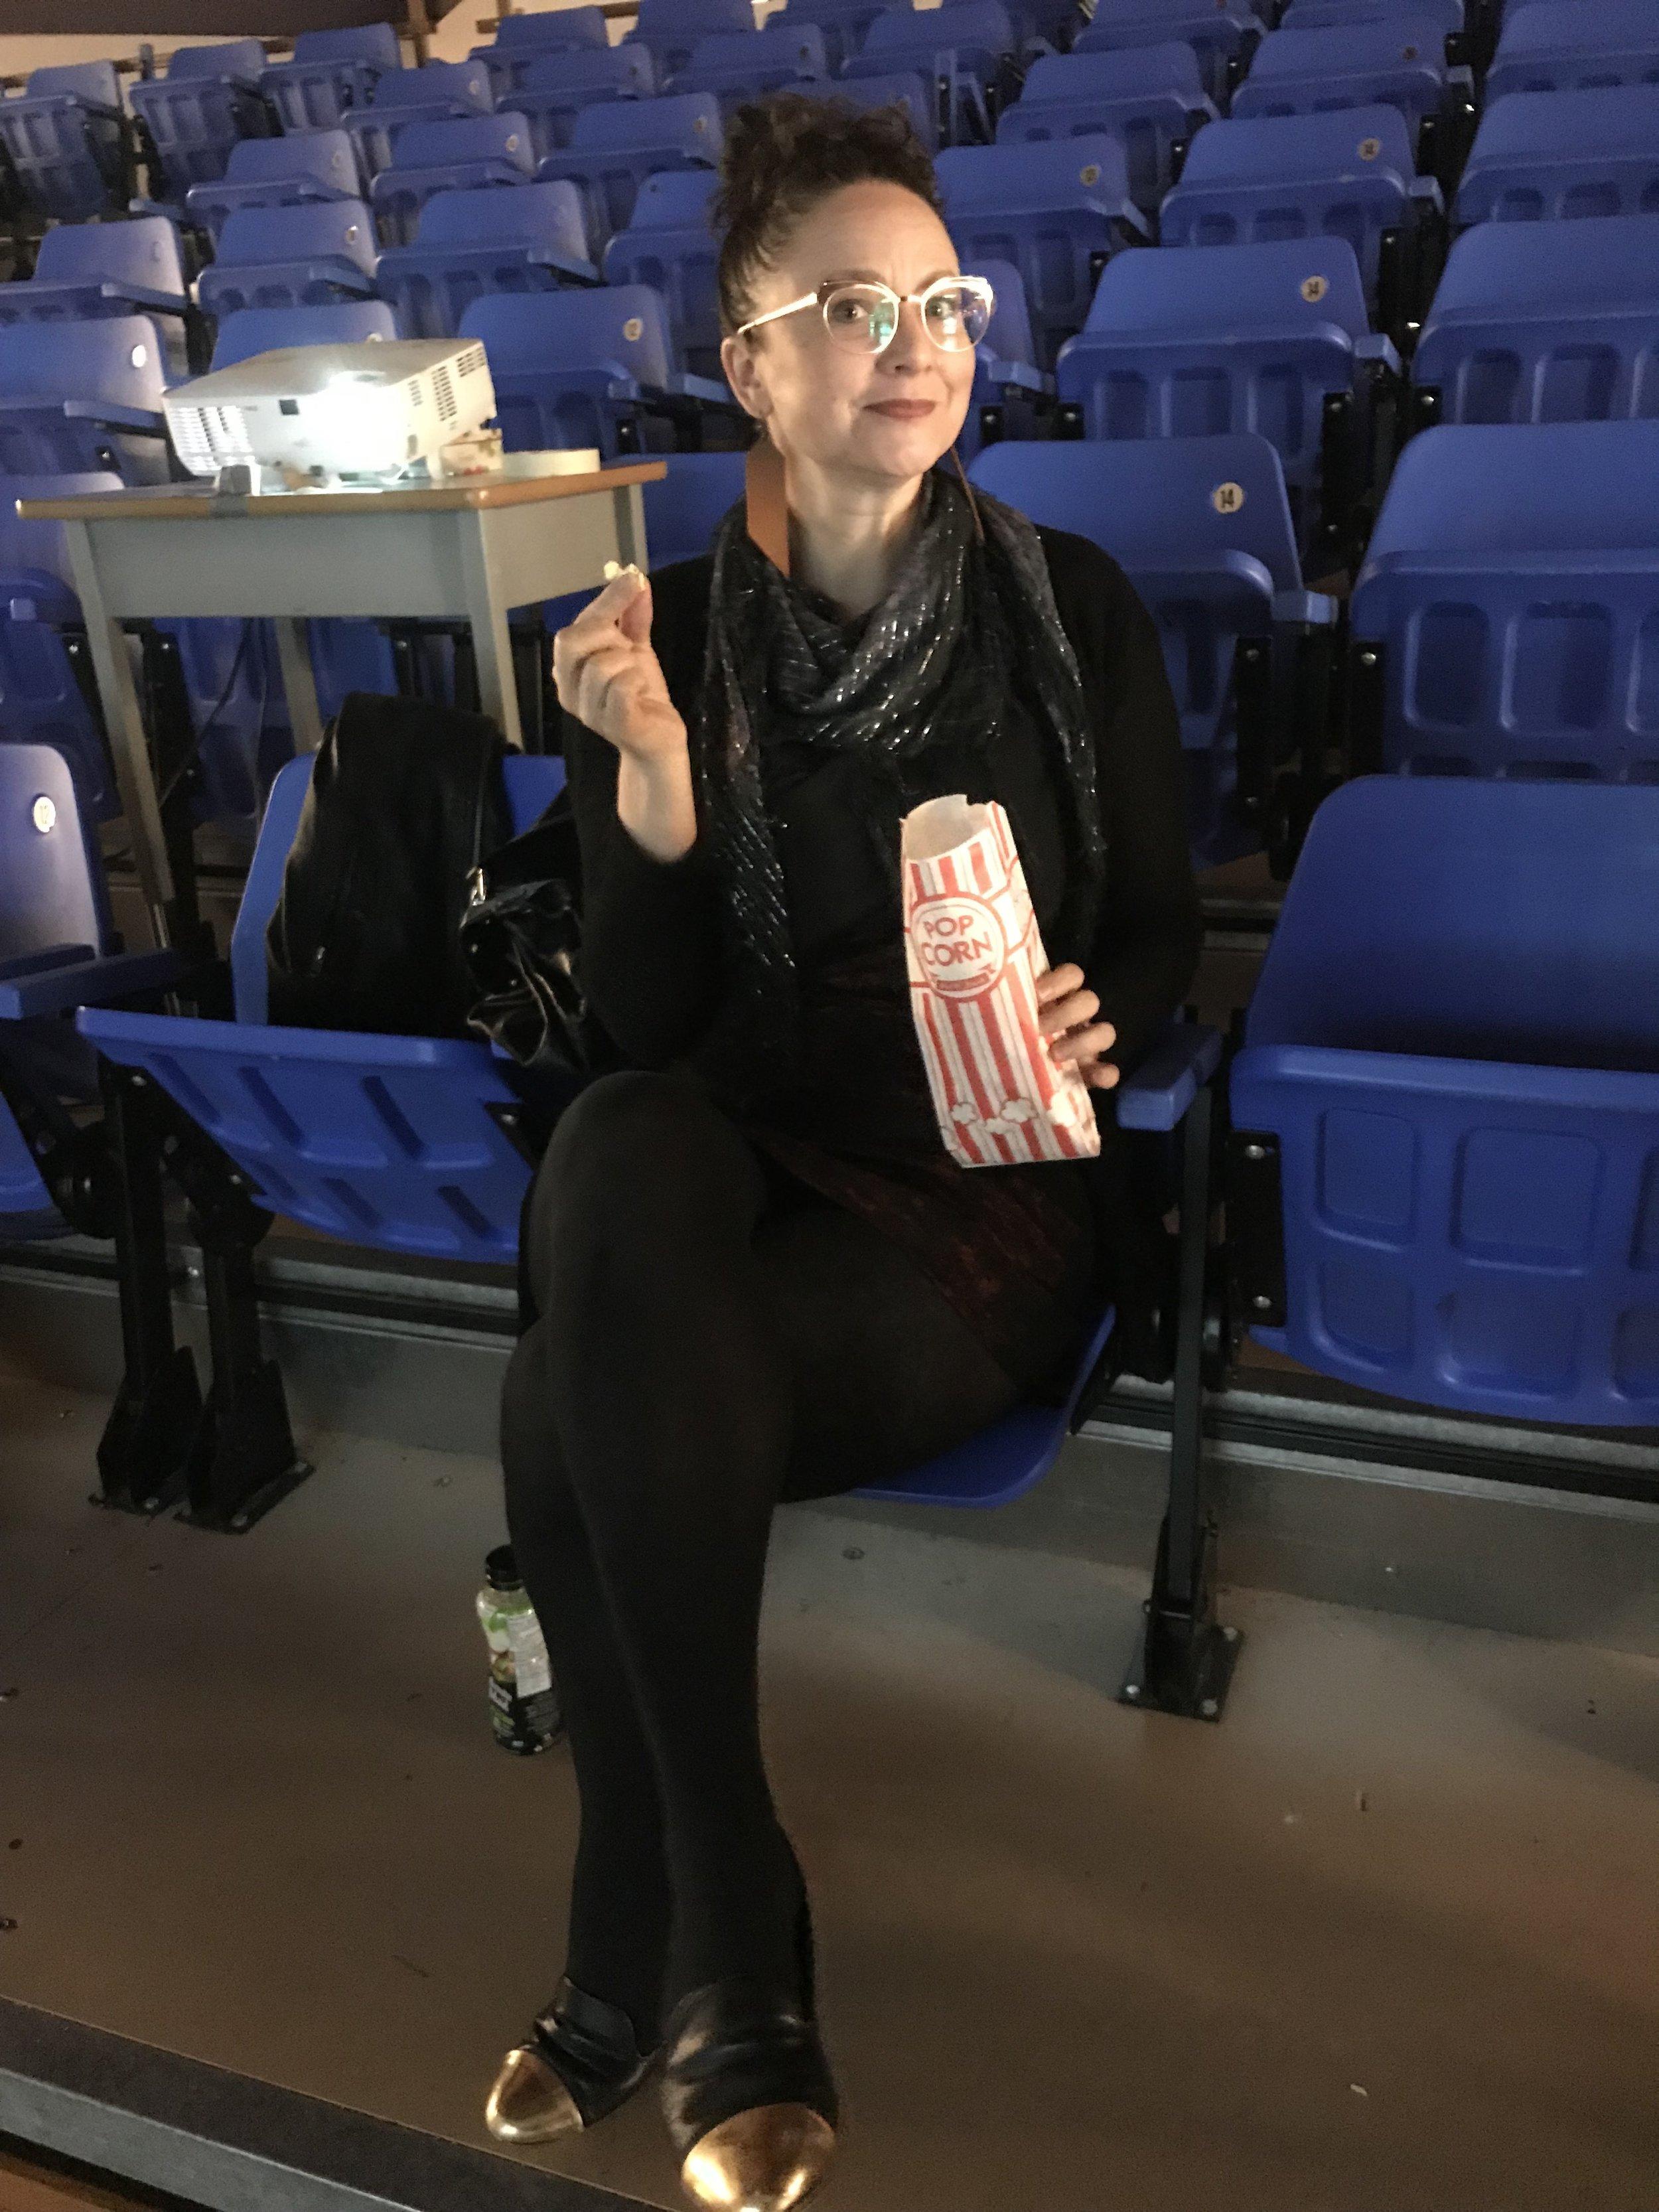 Odessa Shuquaya, filmmaker and curator of the night